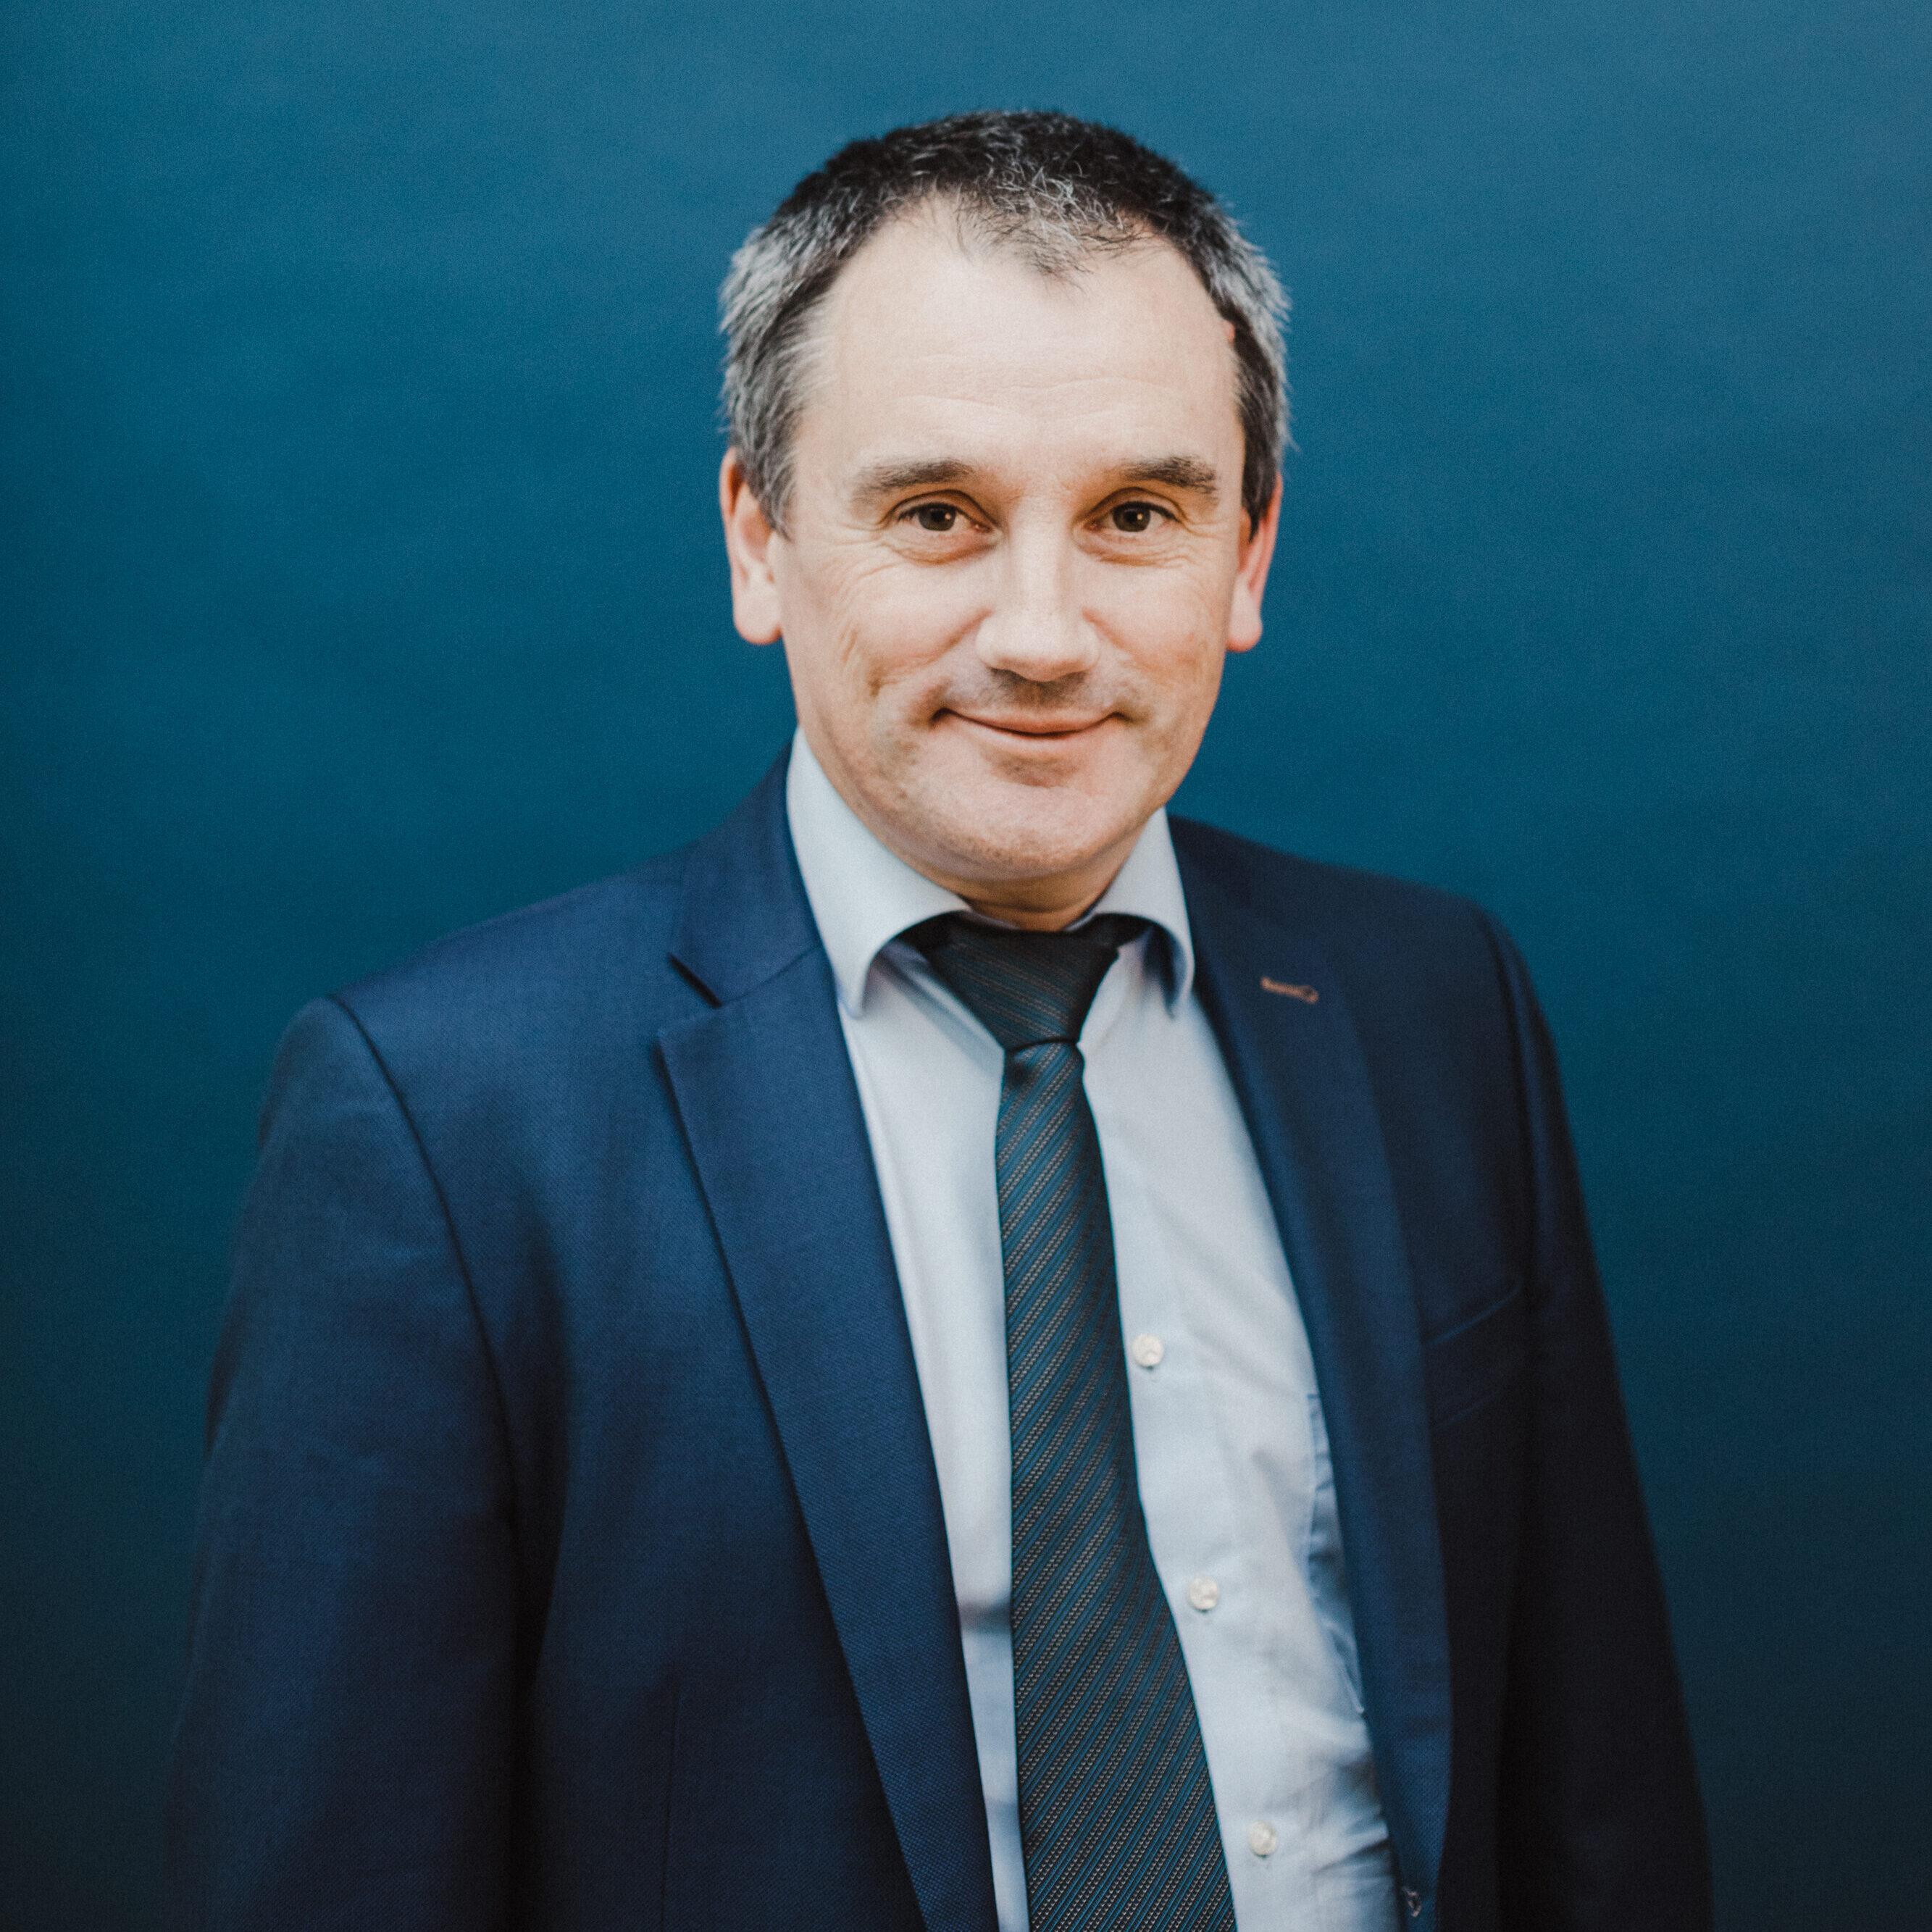 Vincent Kolaczynski Solutions et Scan Manager at CK